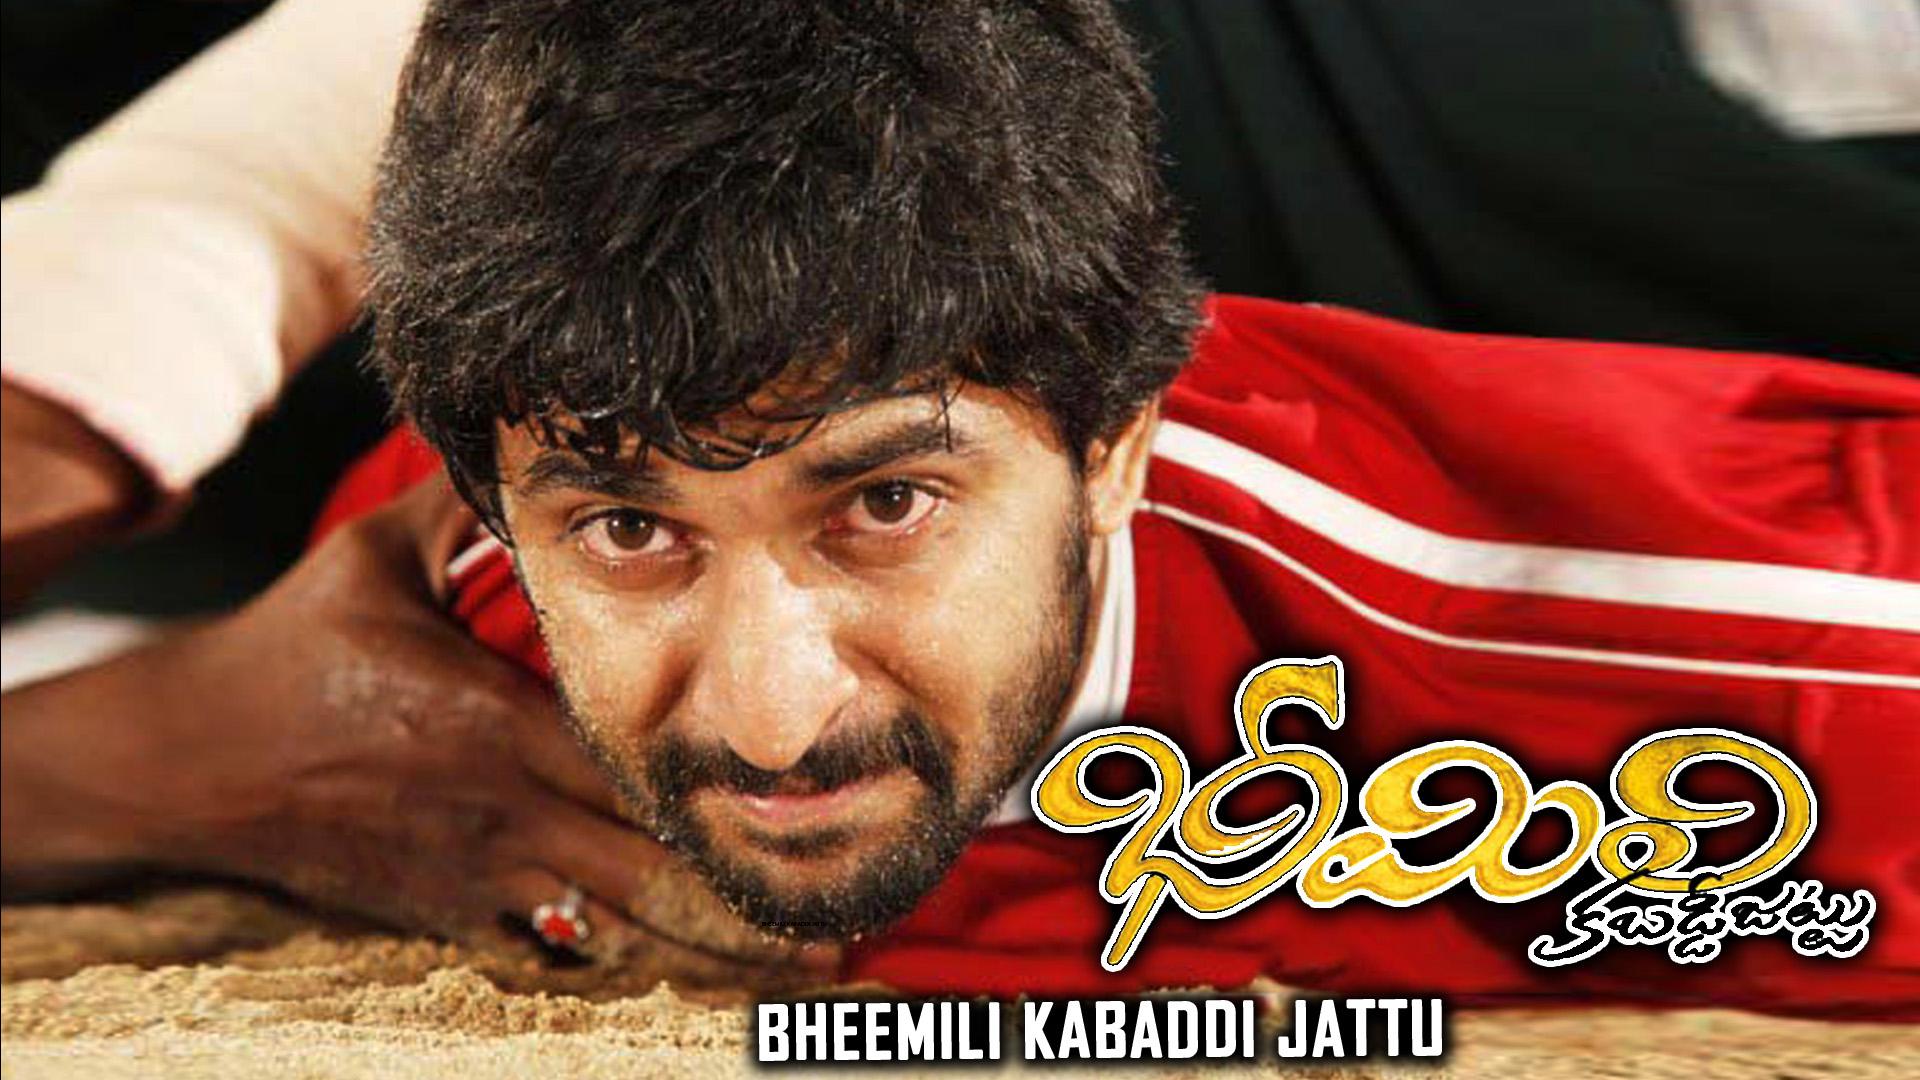 Bheemili Kabaddi Jattu